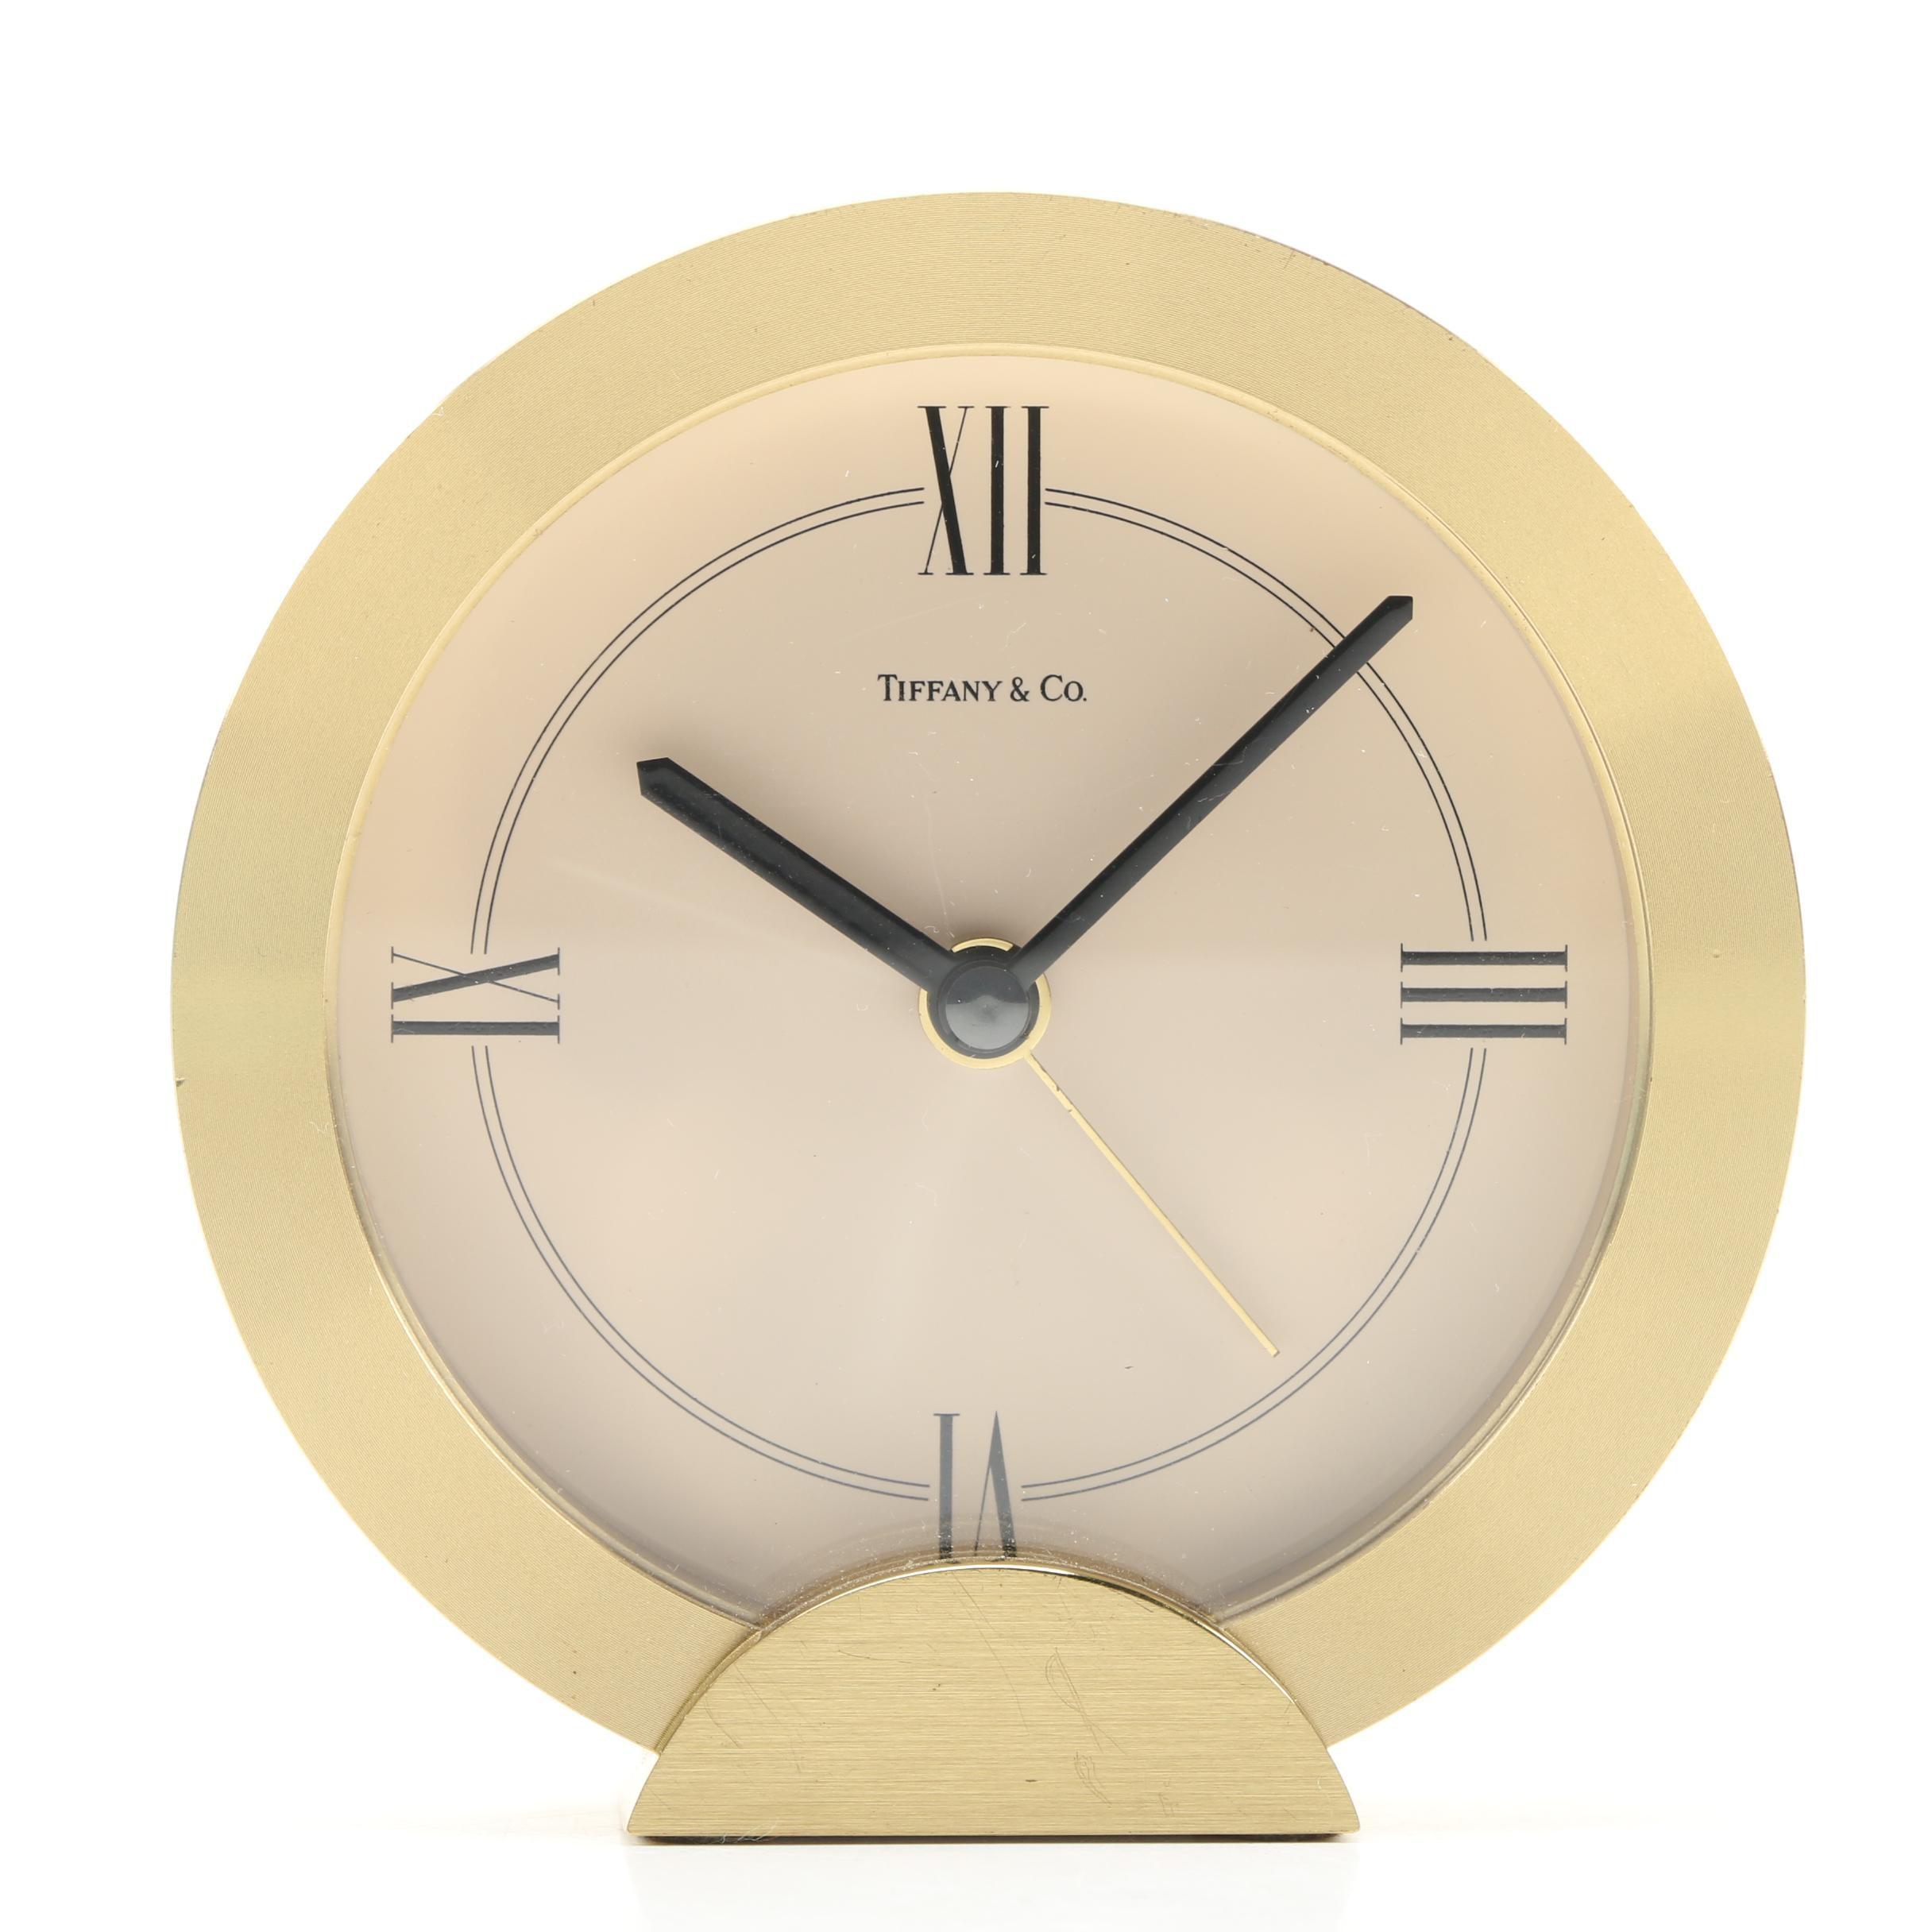 Tiffany & Co. Brass Alarm Clock